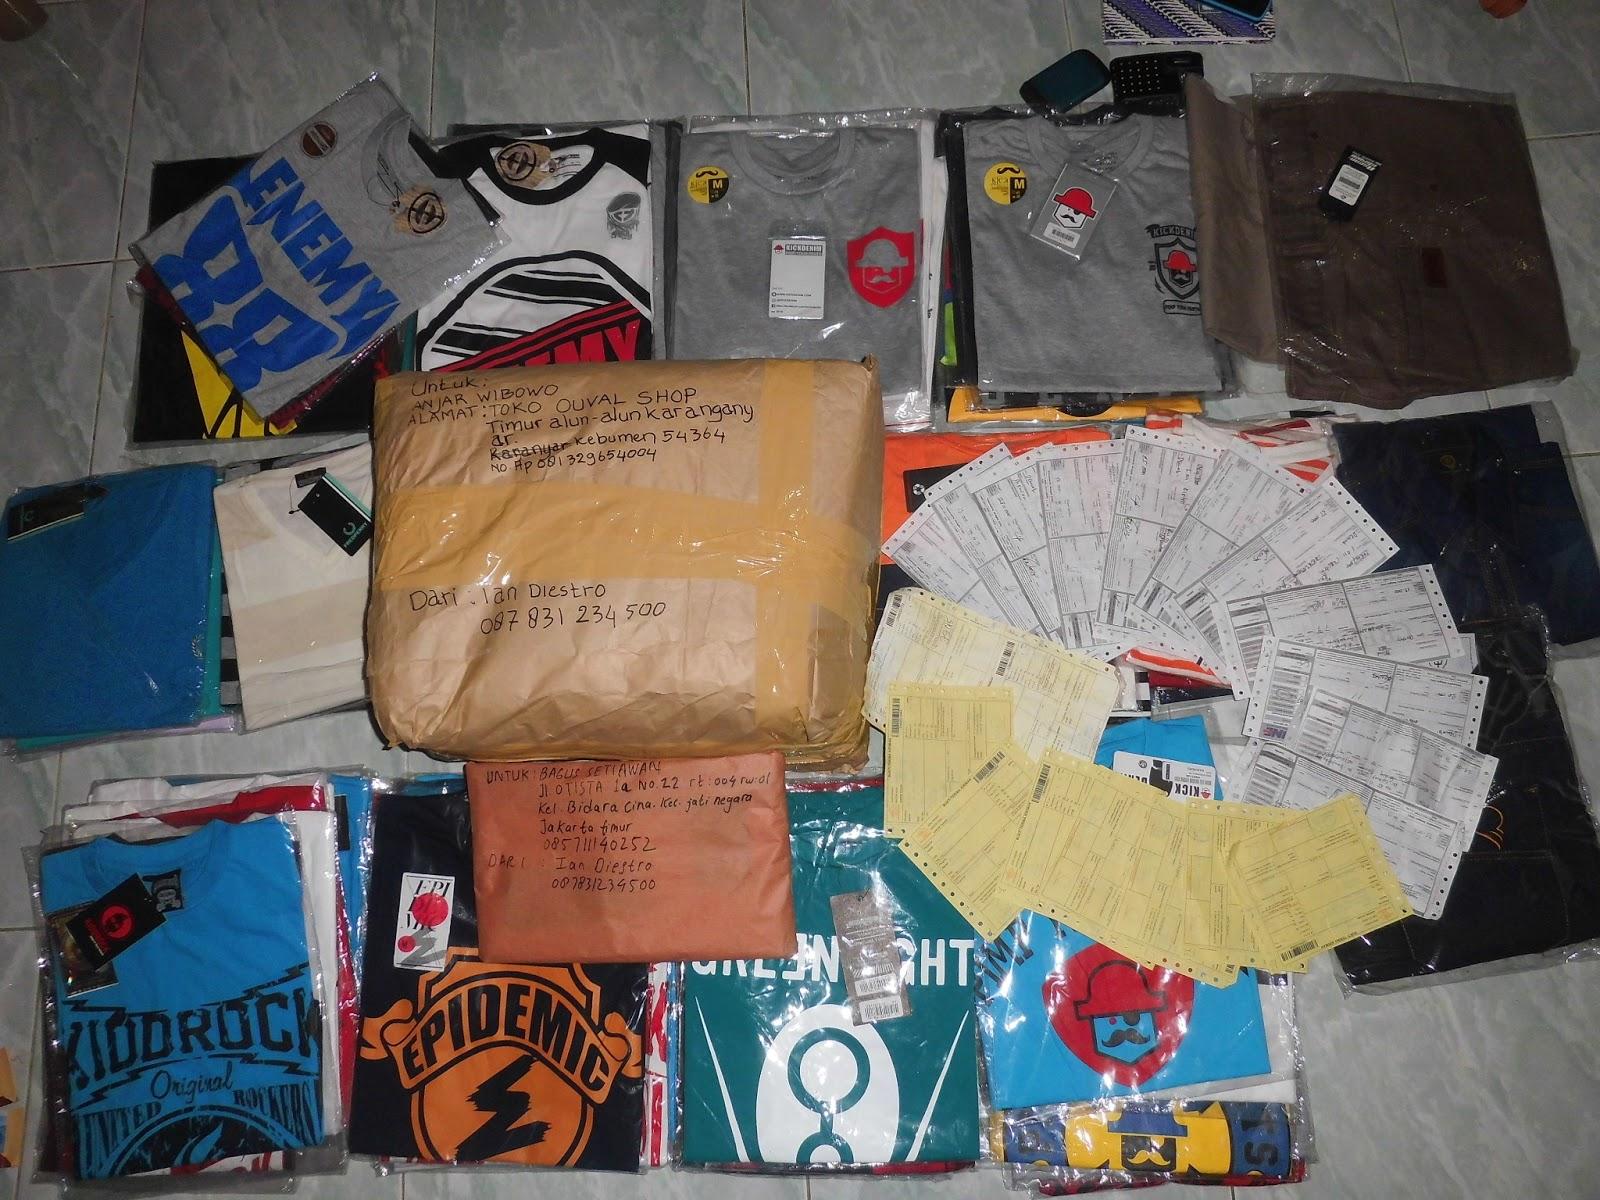 bukti pengiriman pusat kaos distro grosir dan eceran